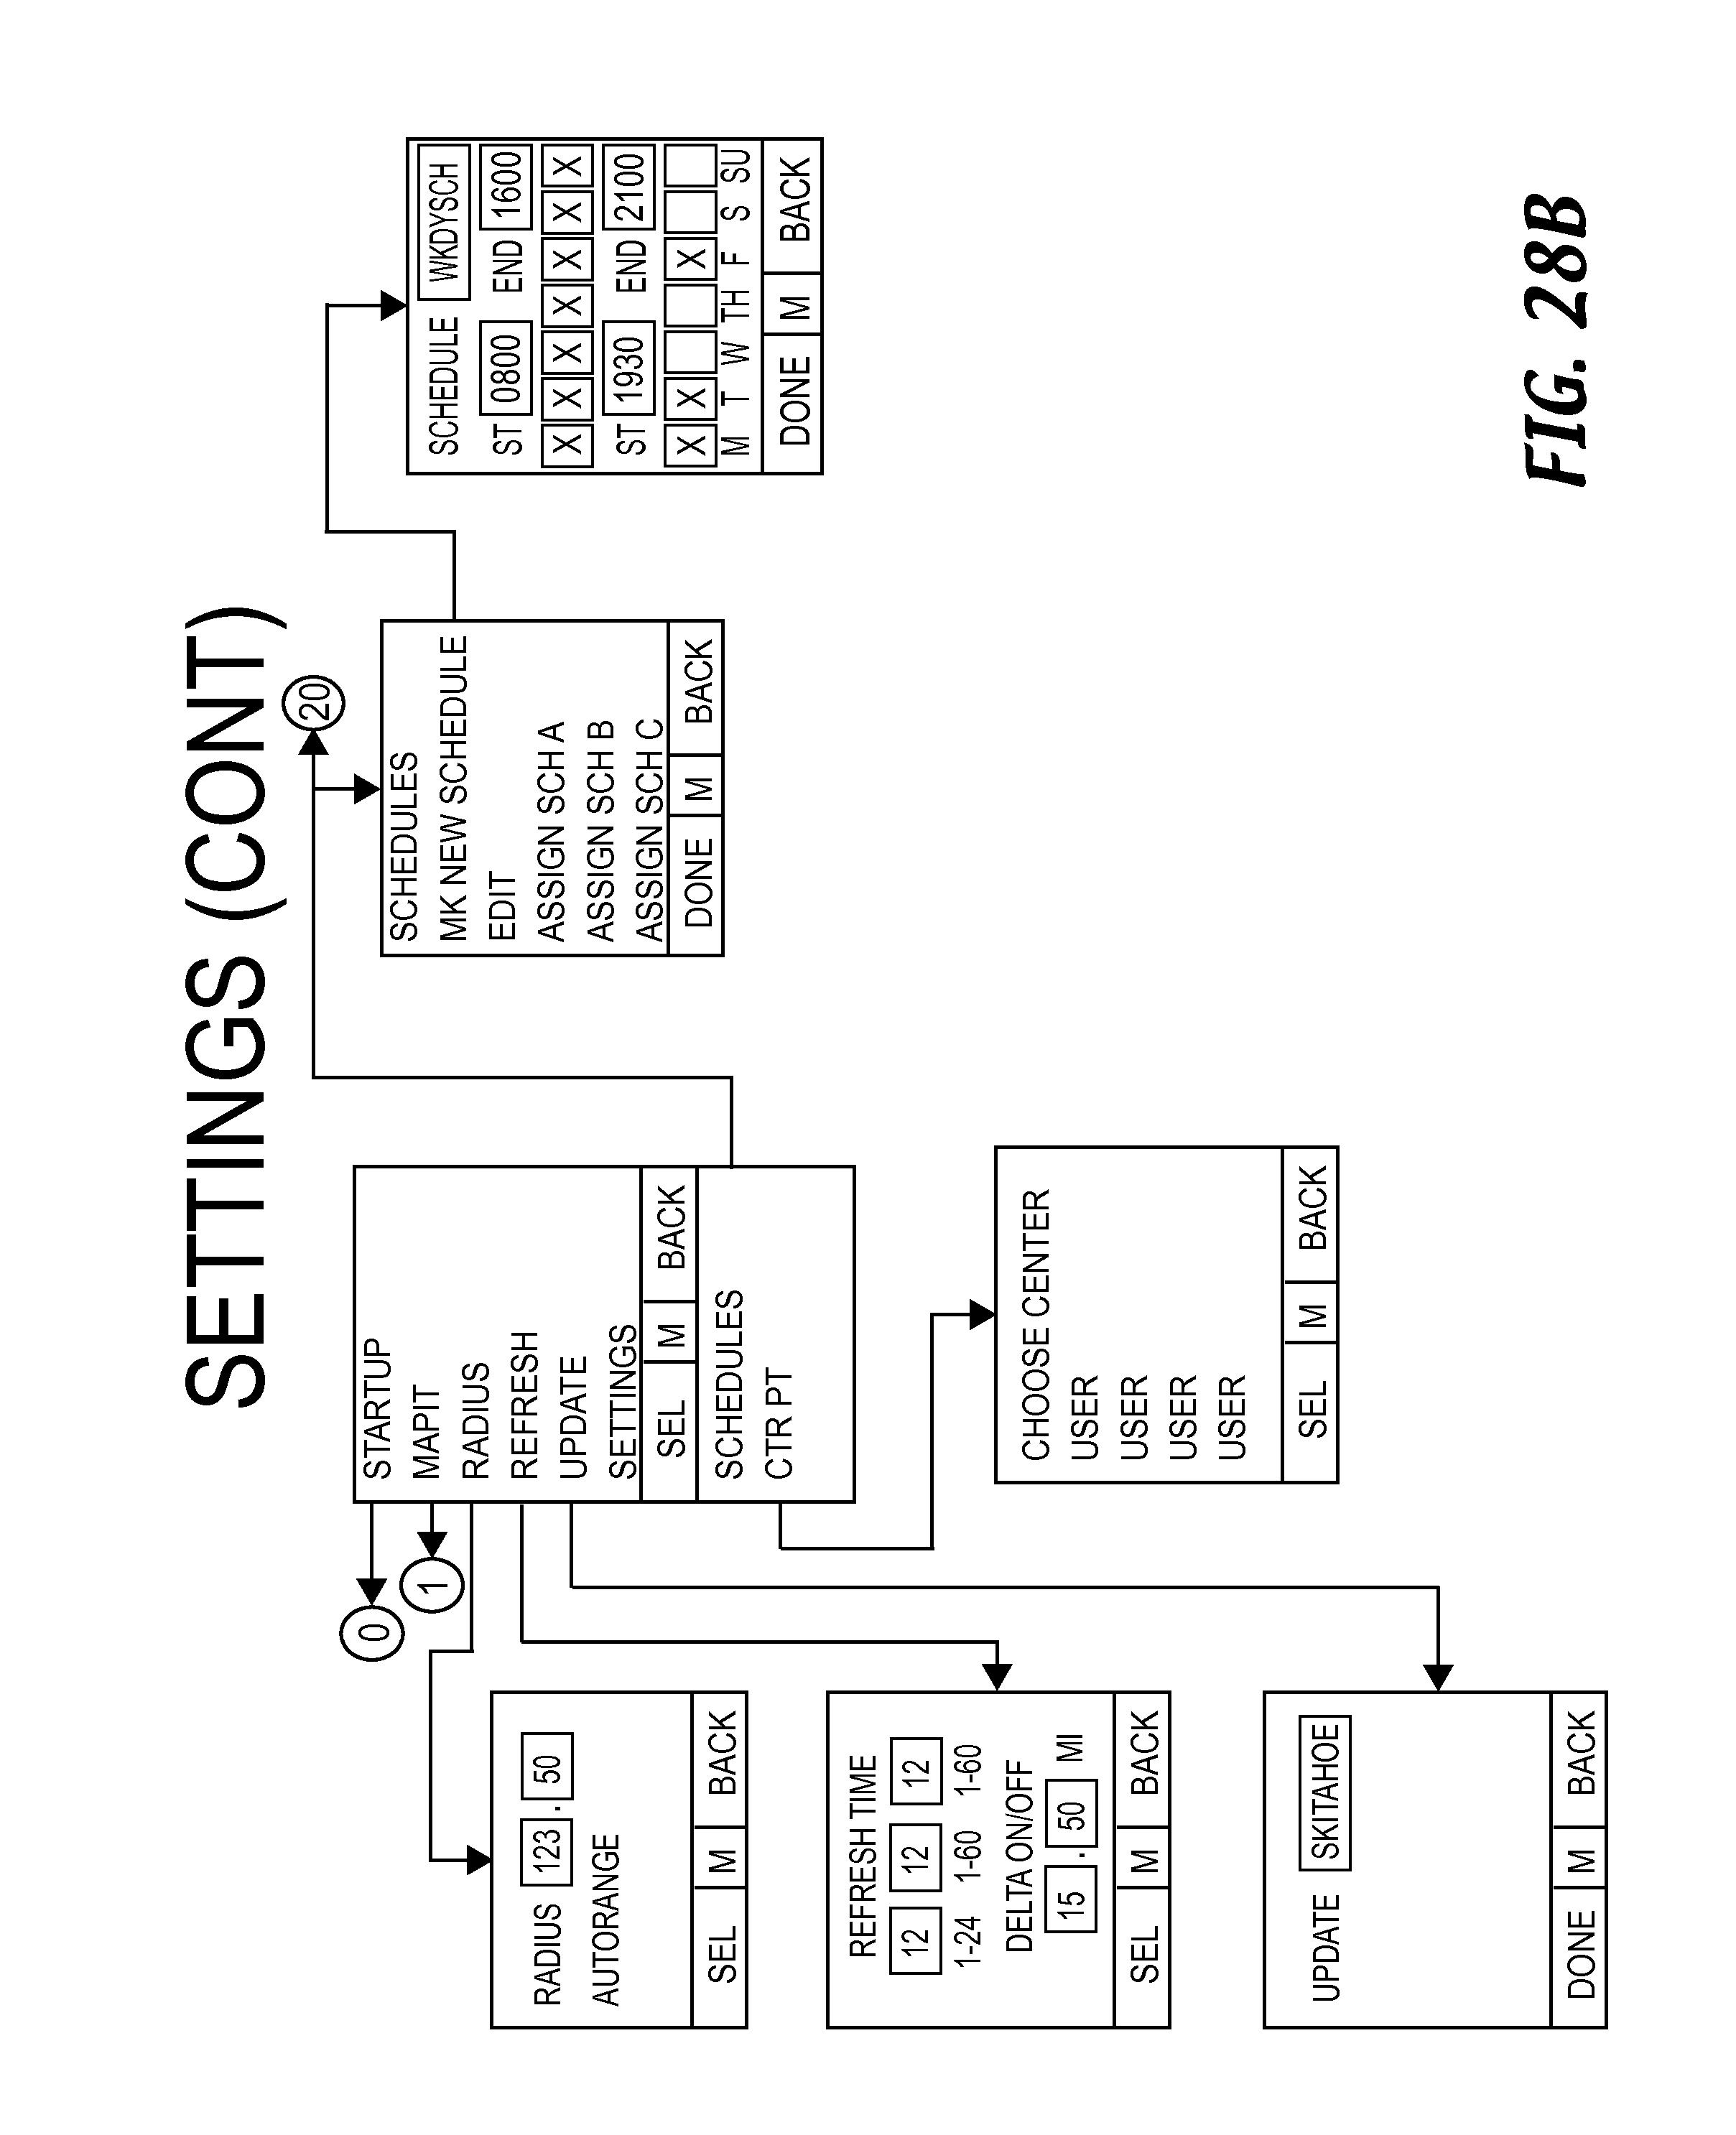 Patent US 8,798,593 B2